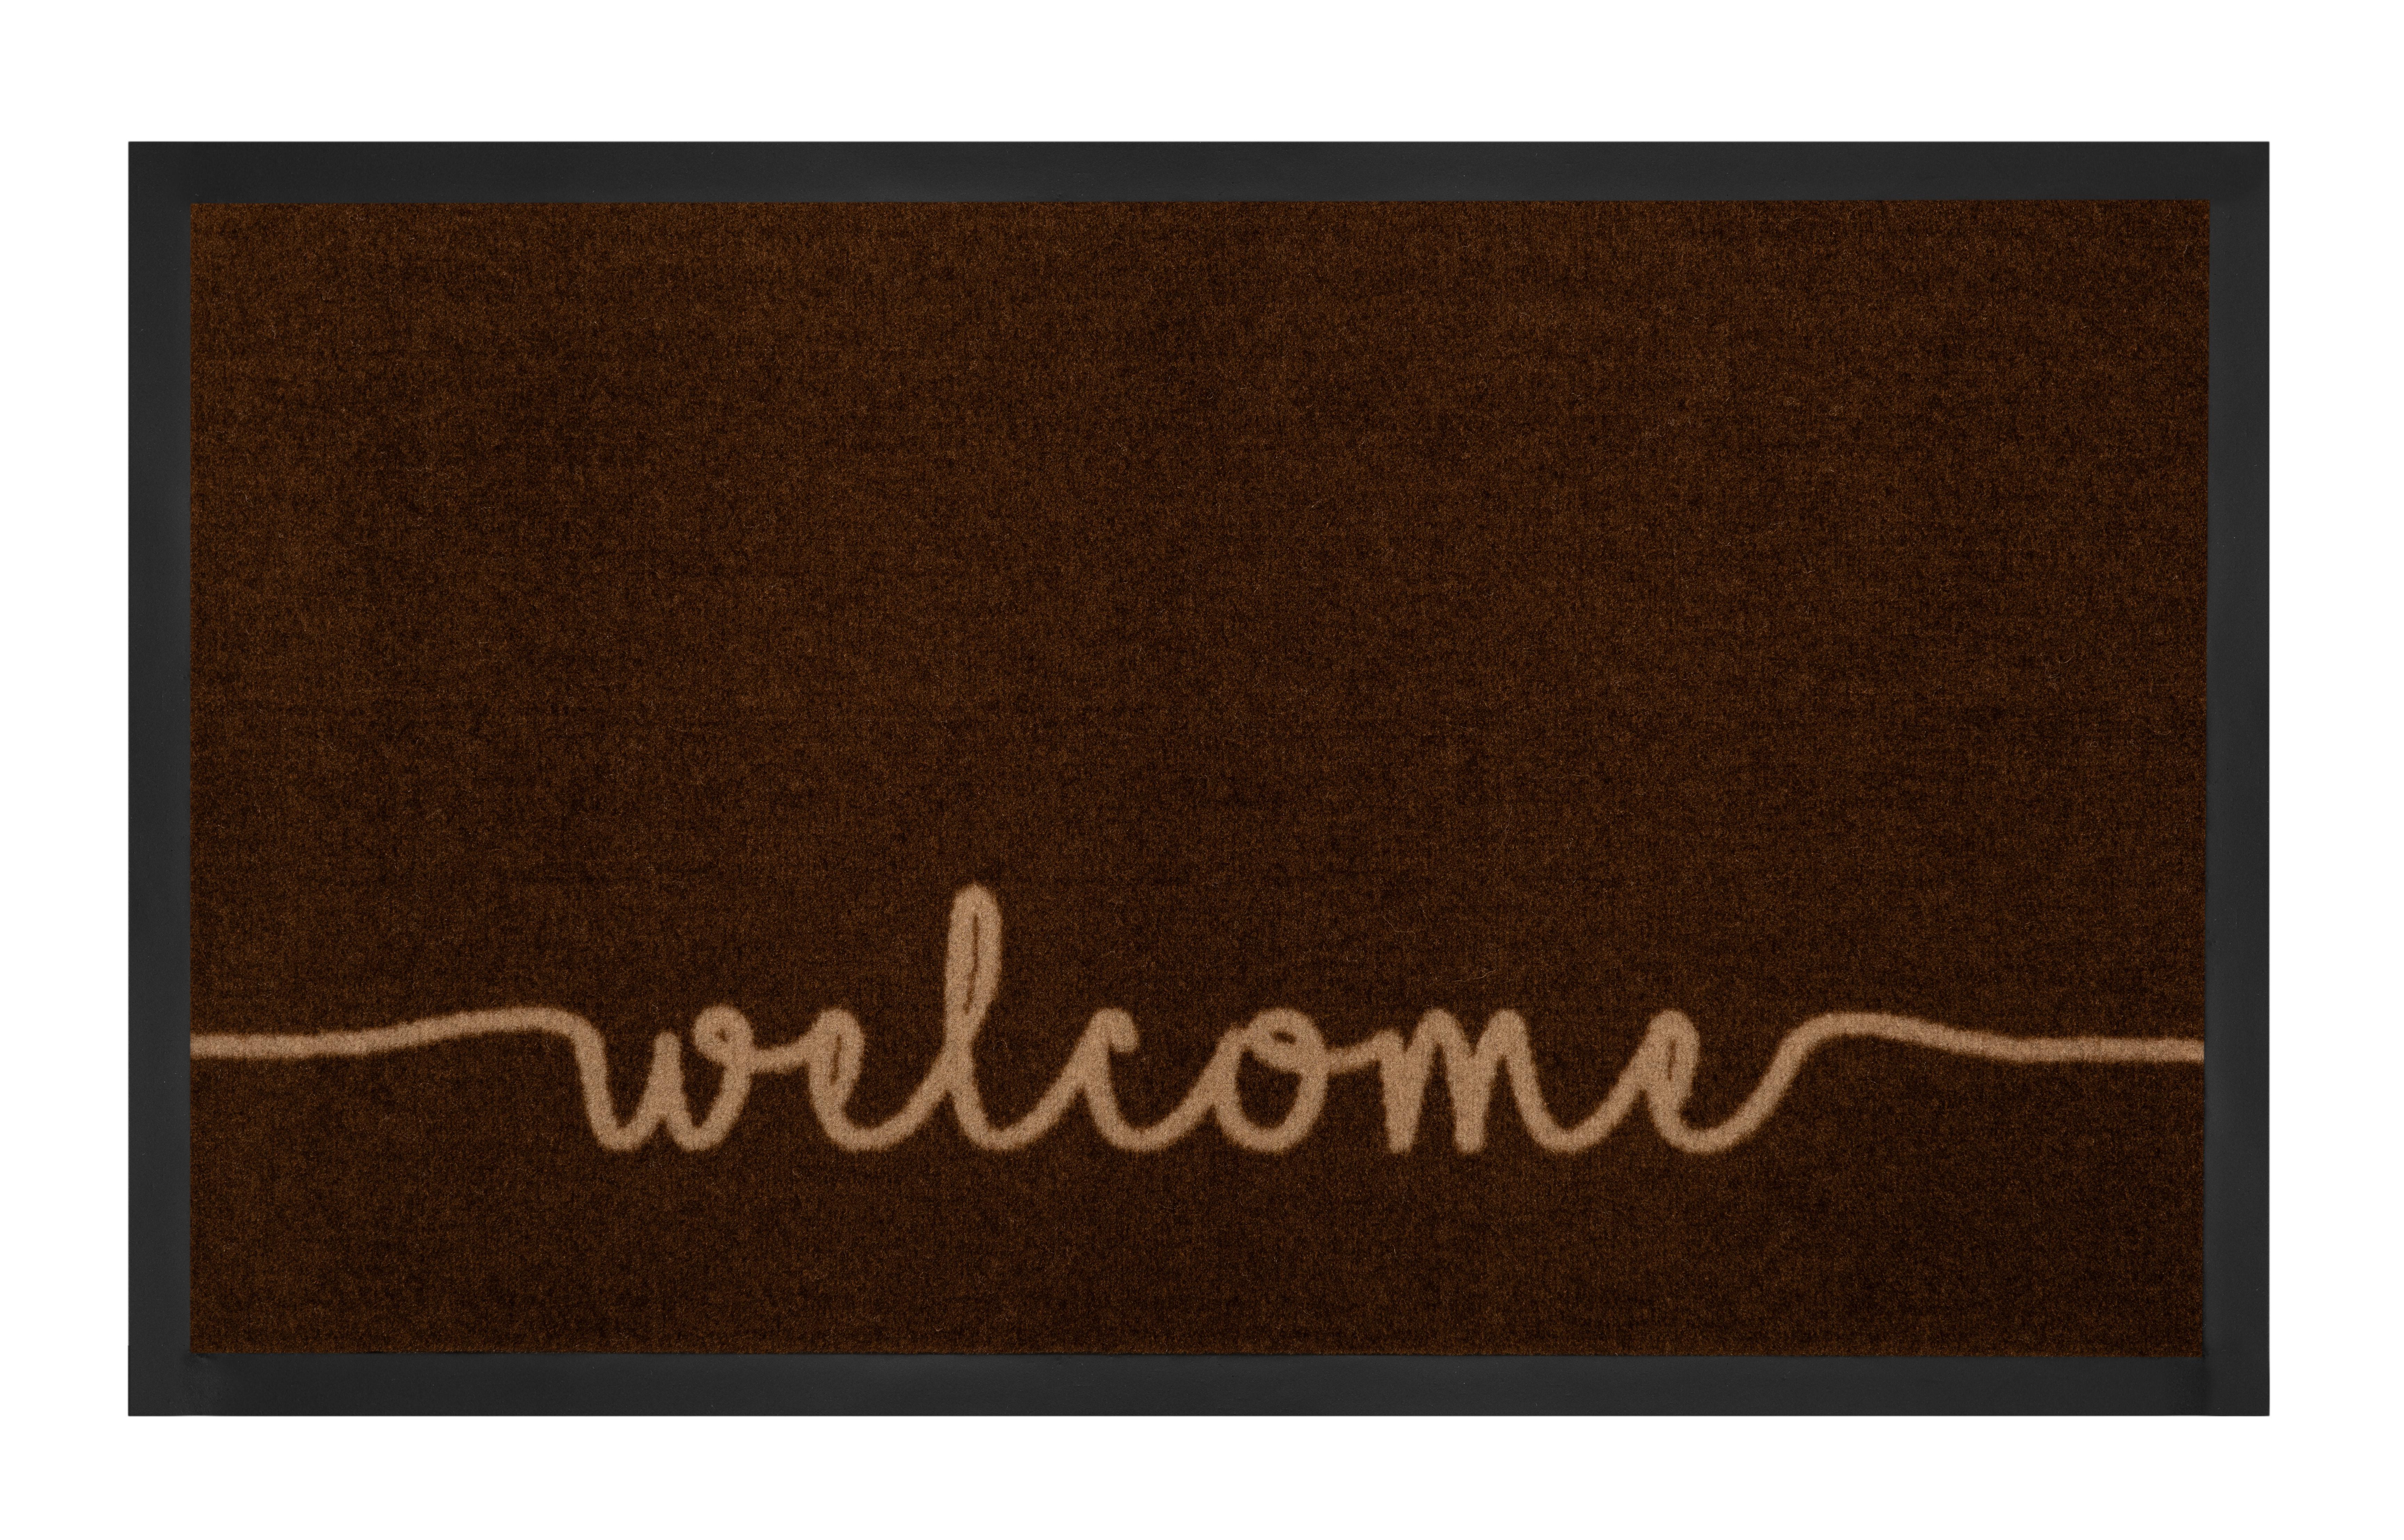 Hanse Home Collection koberce Protiskluzová rohožka Printy 103795 Darkbrown Beige - 45x75 cm